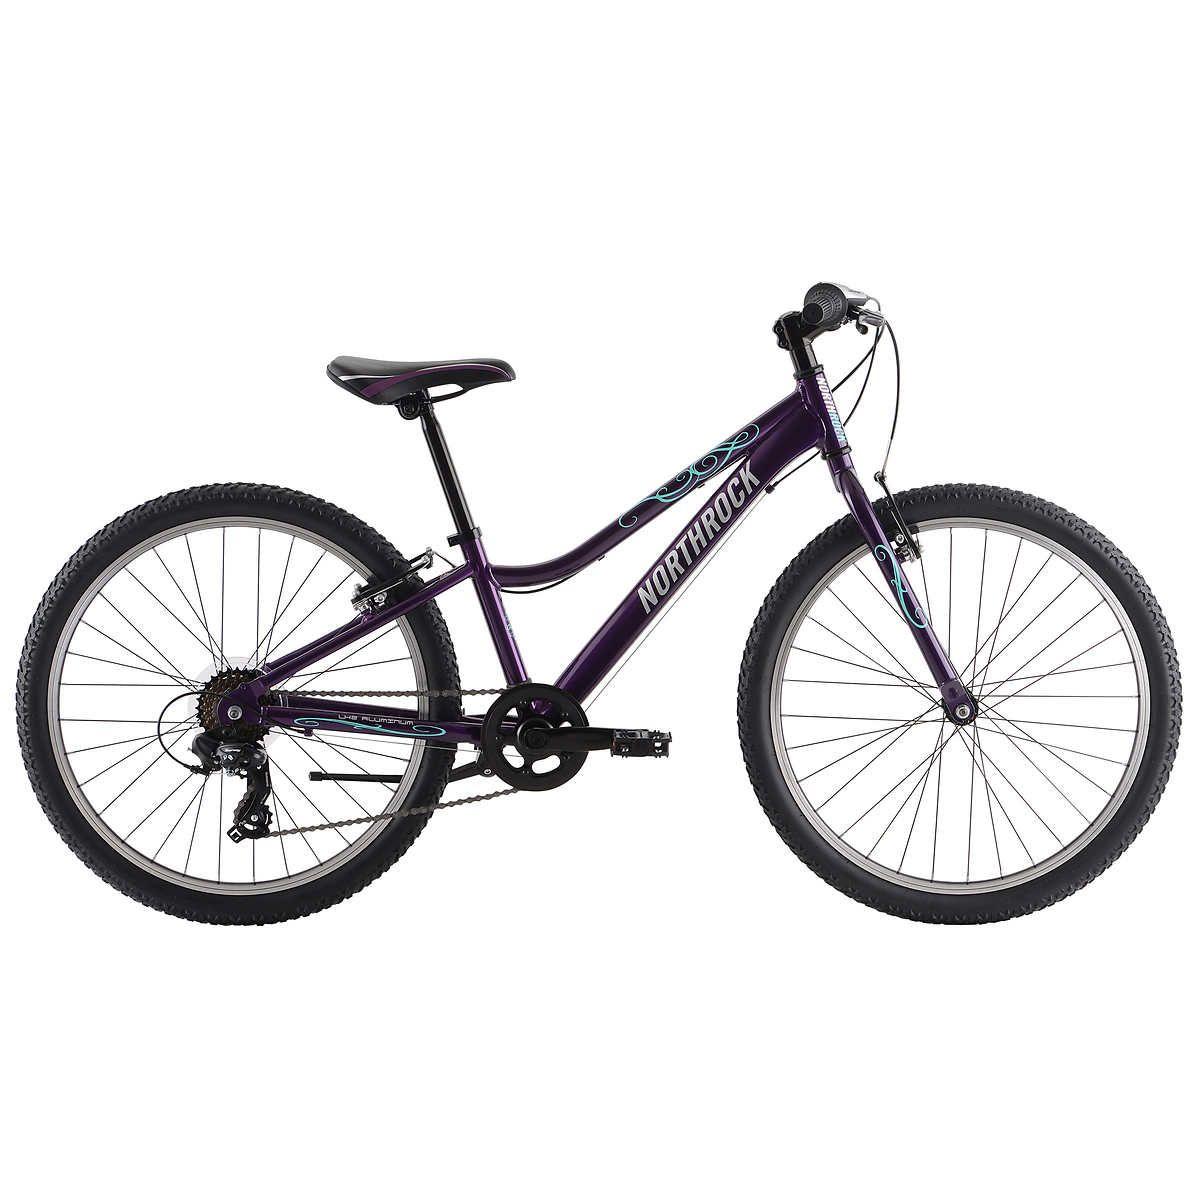 Northrock Gs24 Girl S Bike In 2020 Bike Local Bike Shop Bike Shop